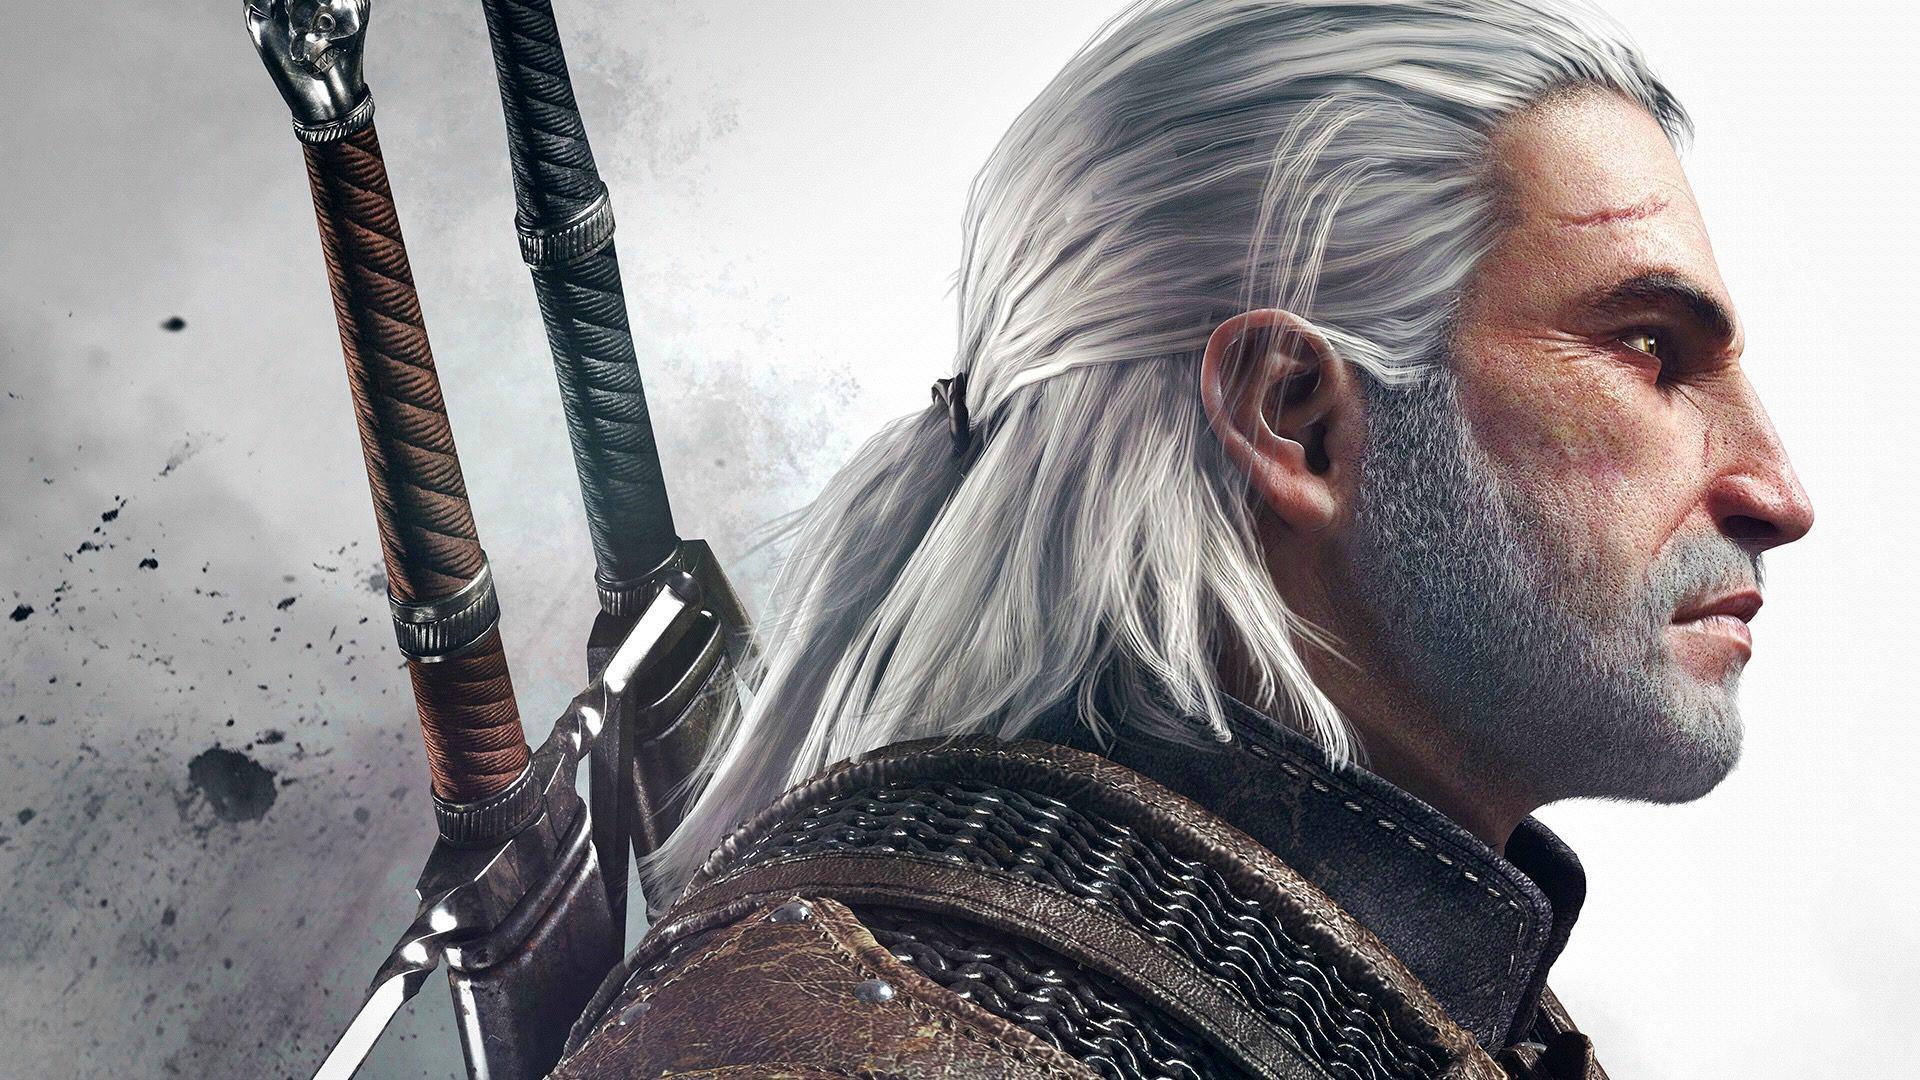 Video Game The Witcher Wild Hunt wallpapers Desktop Phone